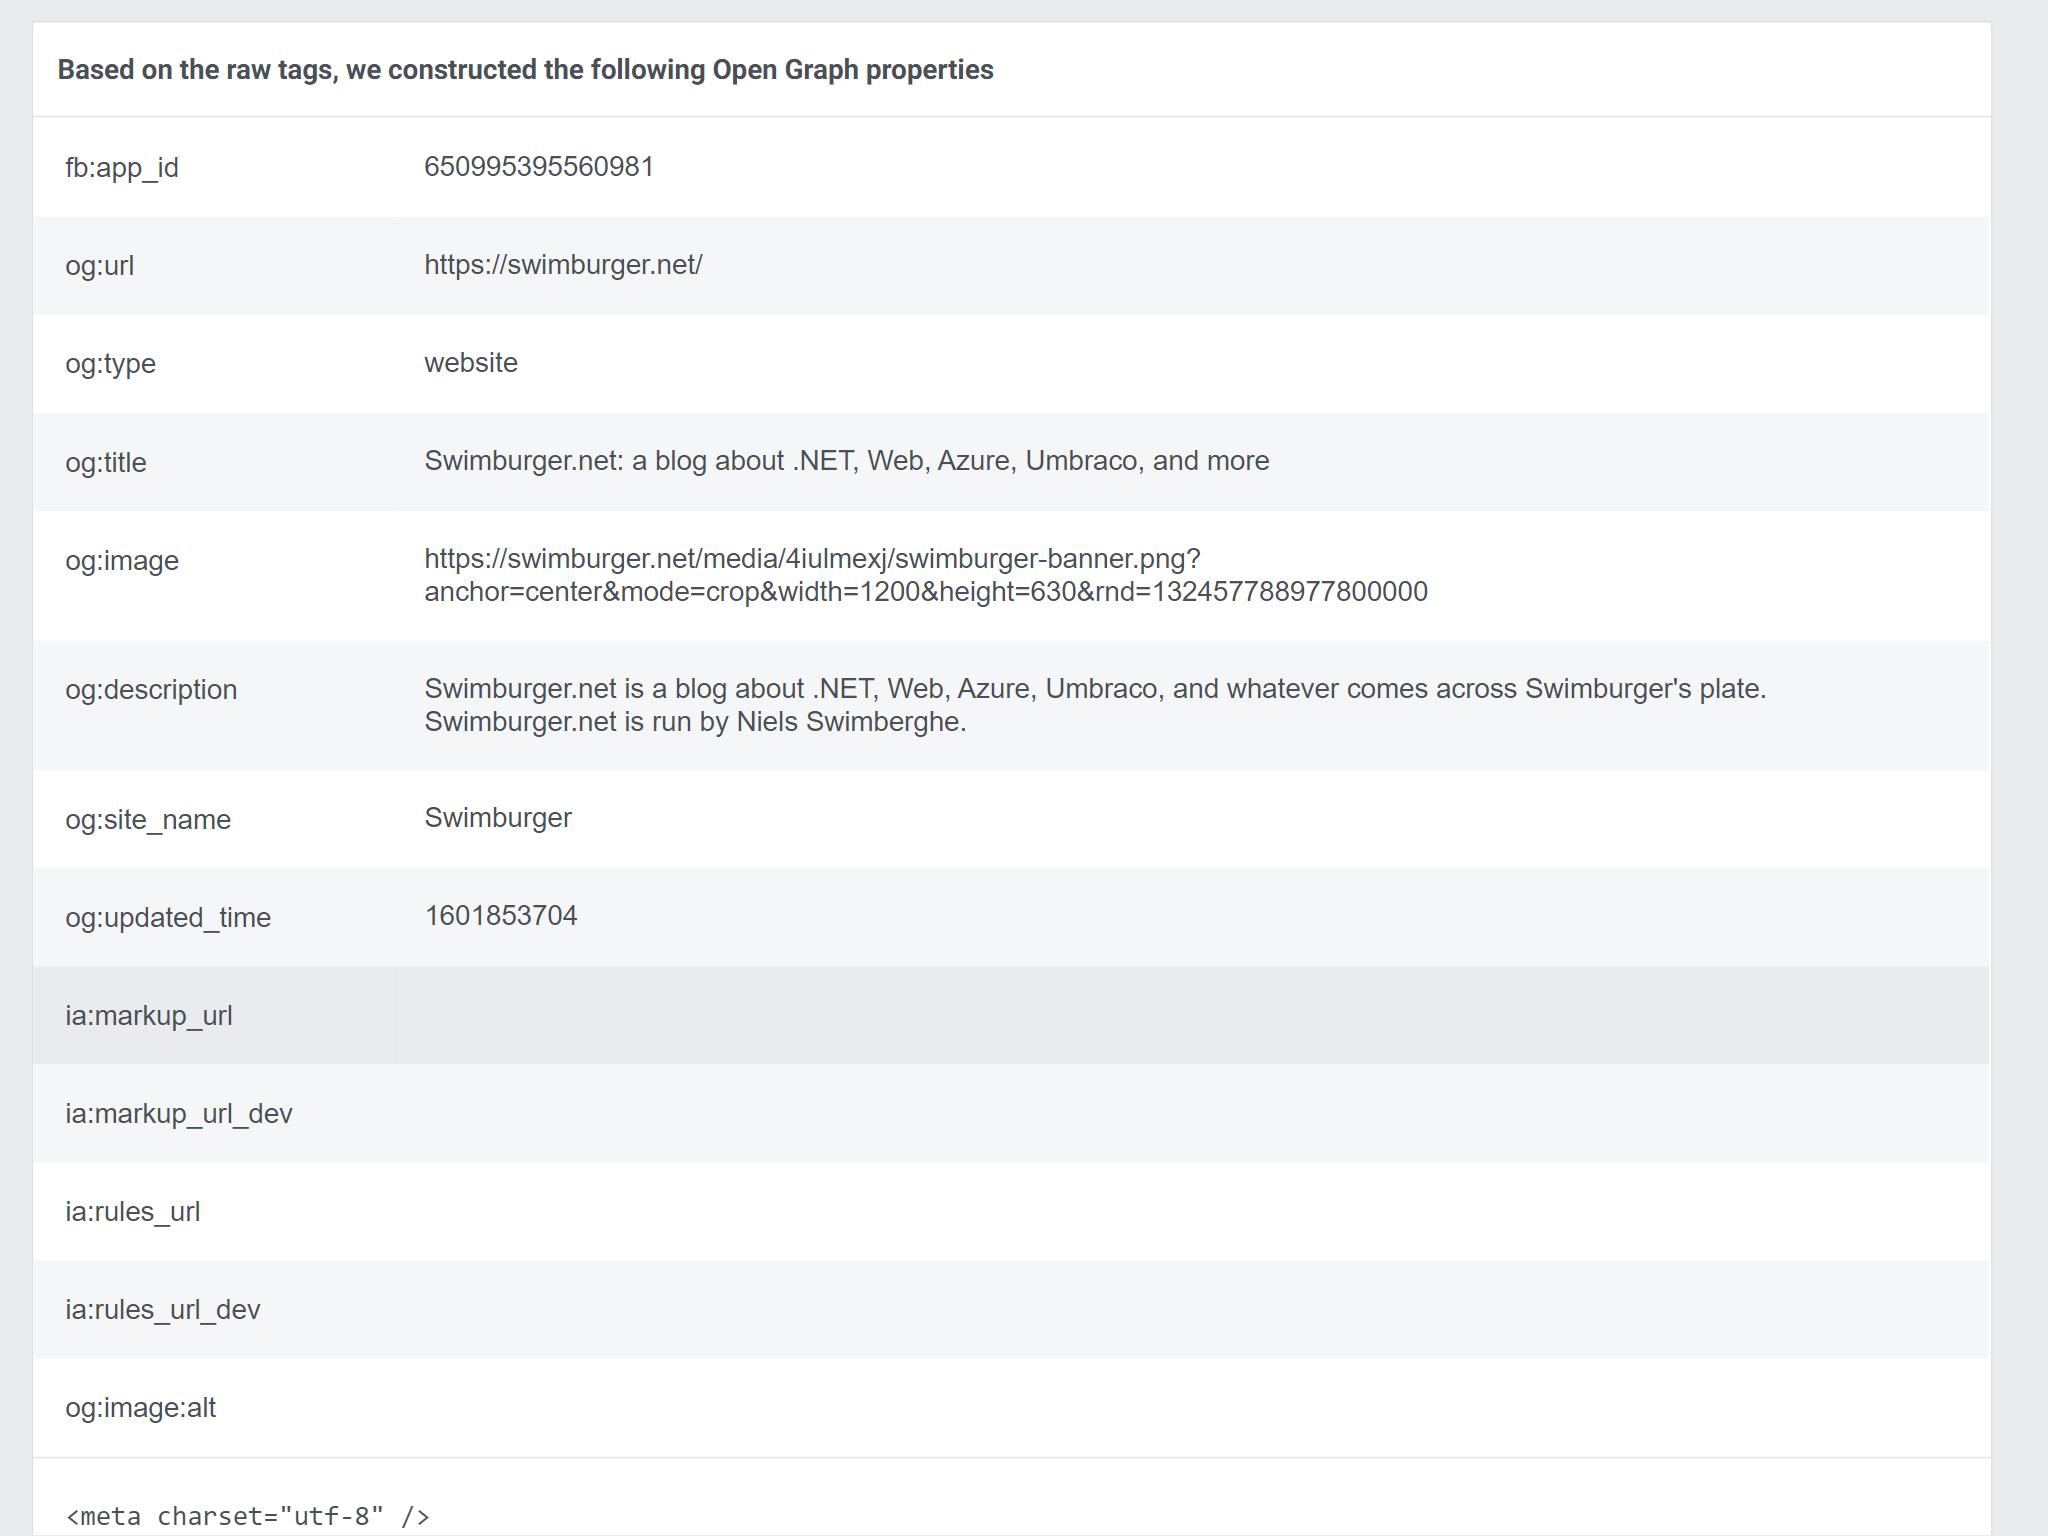 Screenshot of Facebook Debugger meta tag data for swimburger.net